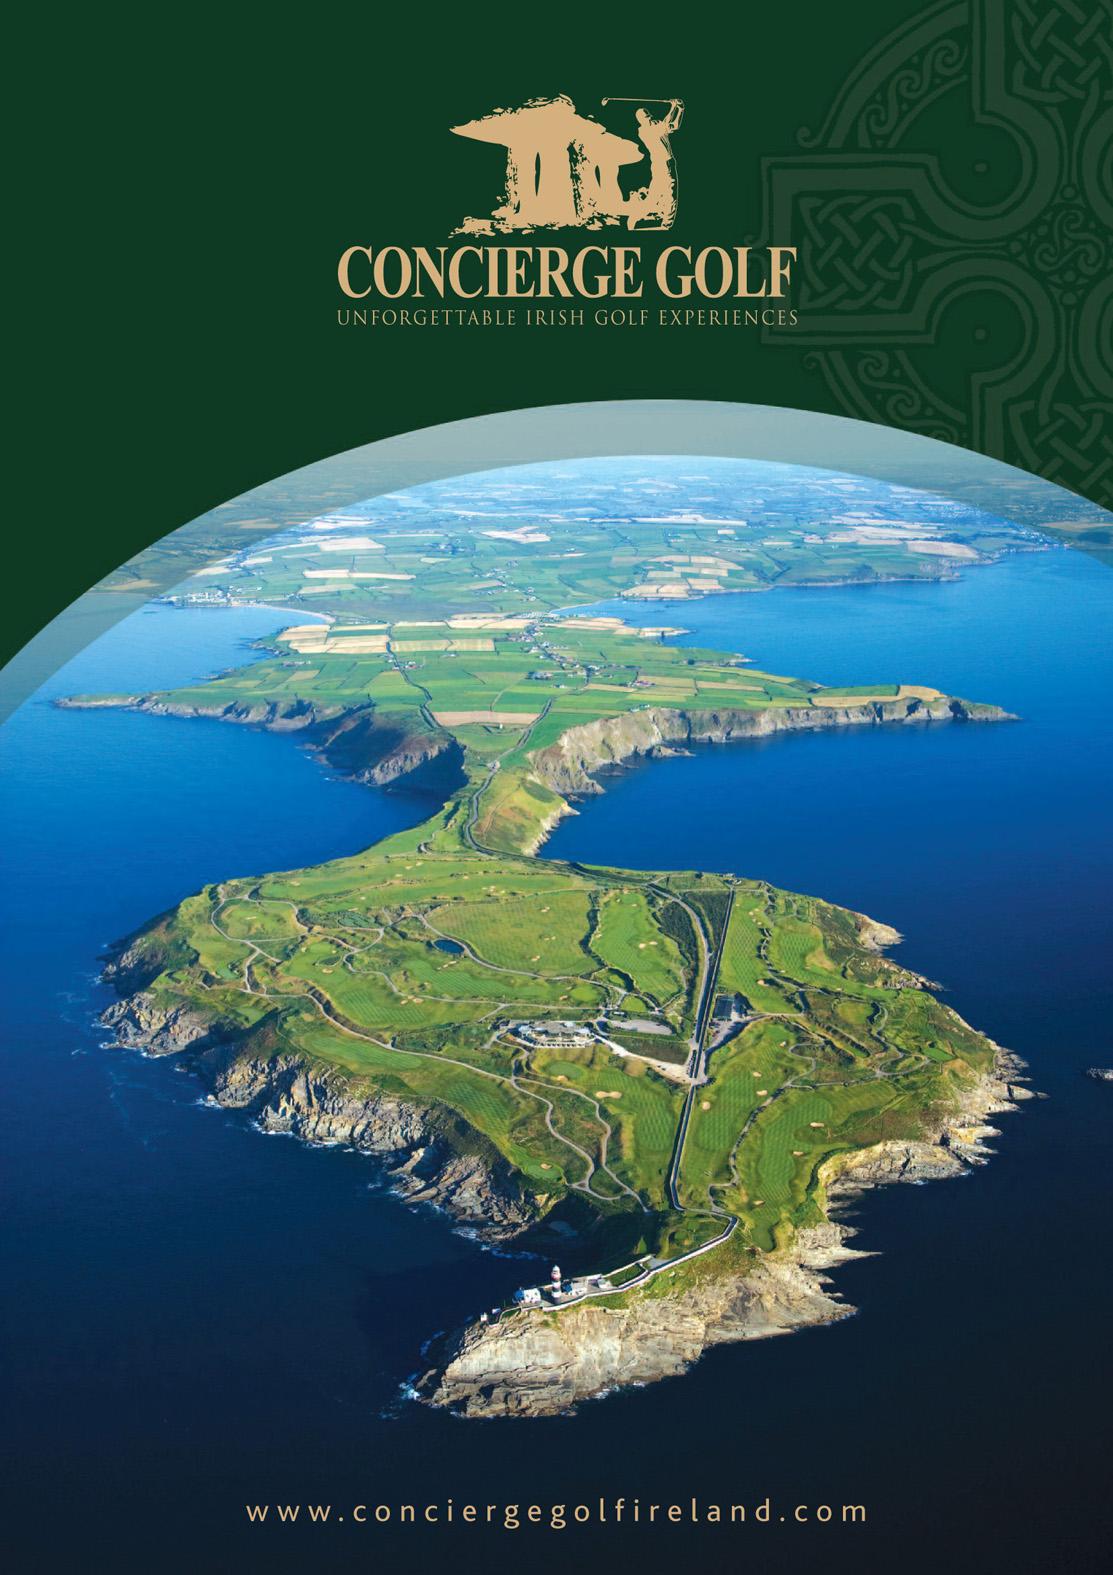 Concierge Golf Brochure Cover.jpg